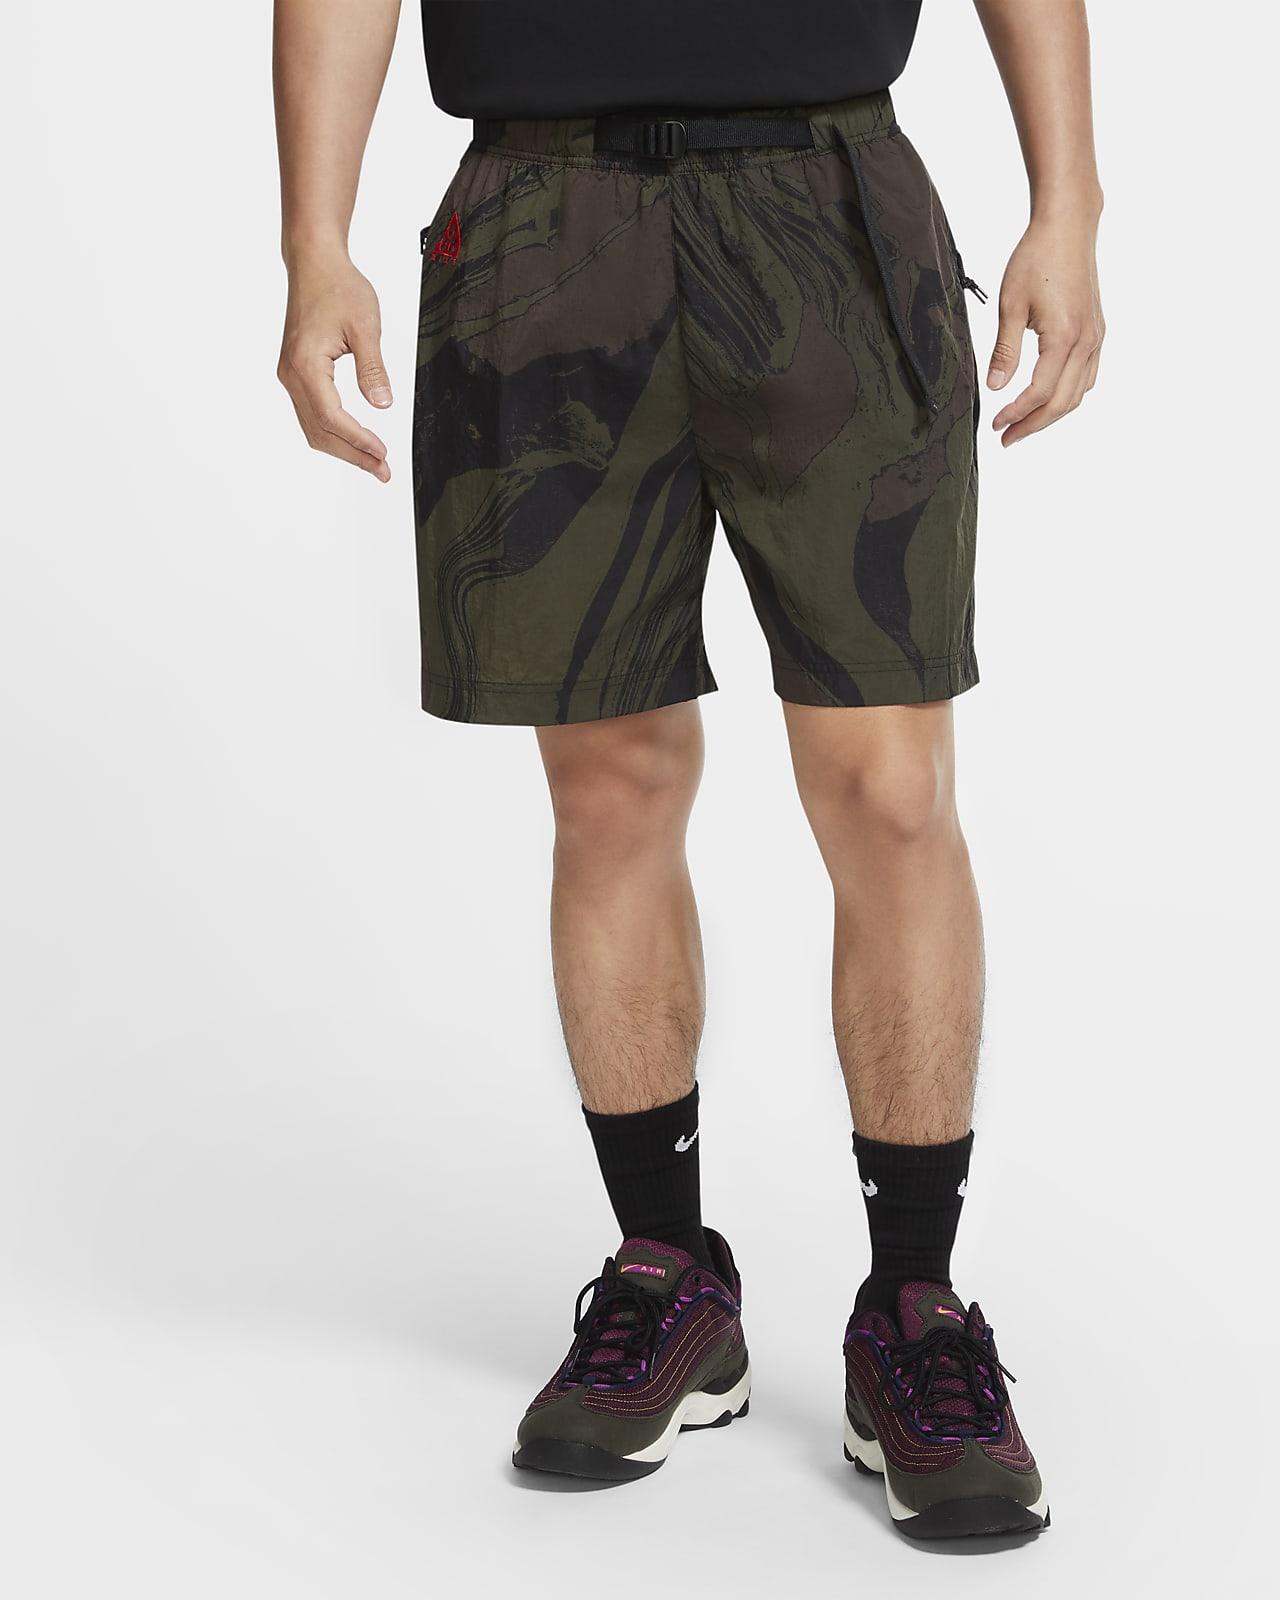 Nike ACG Mt. Fuji Men's Shorts